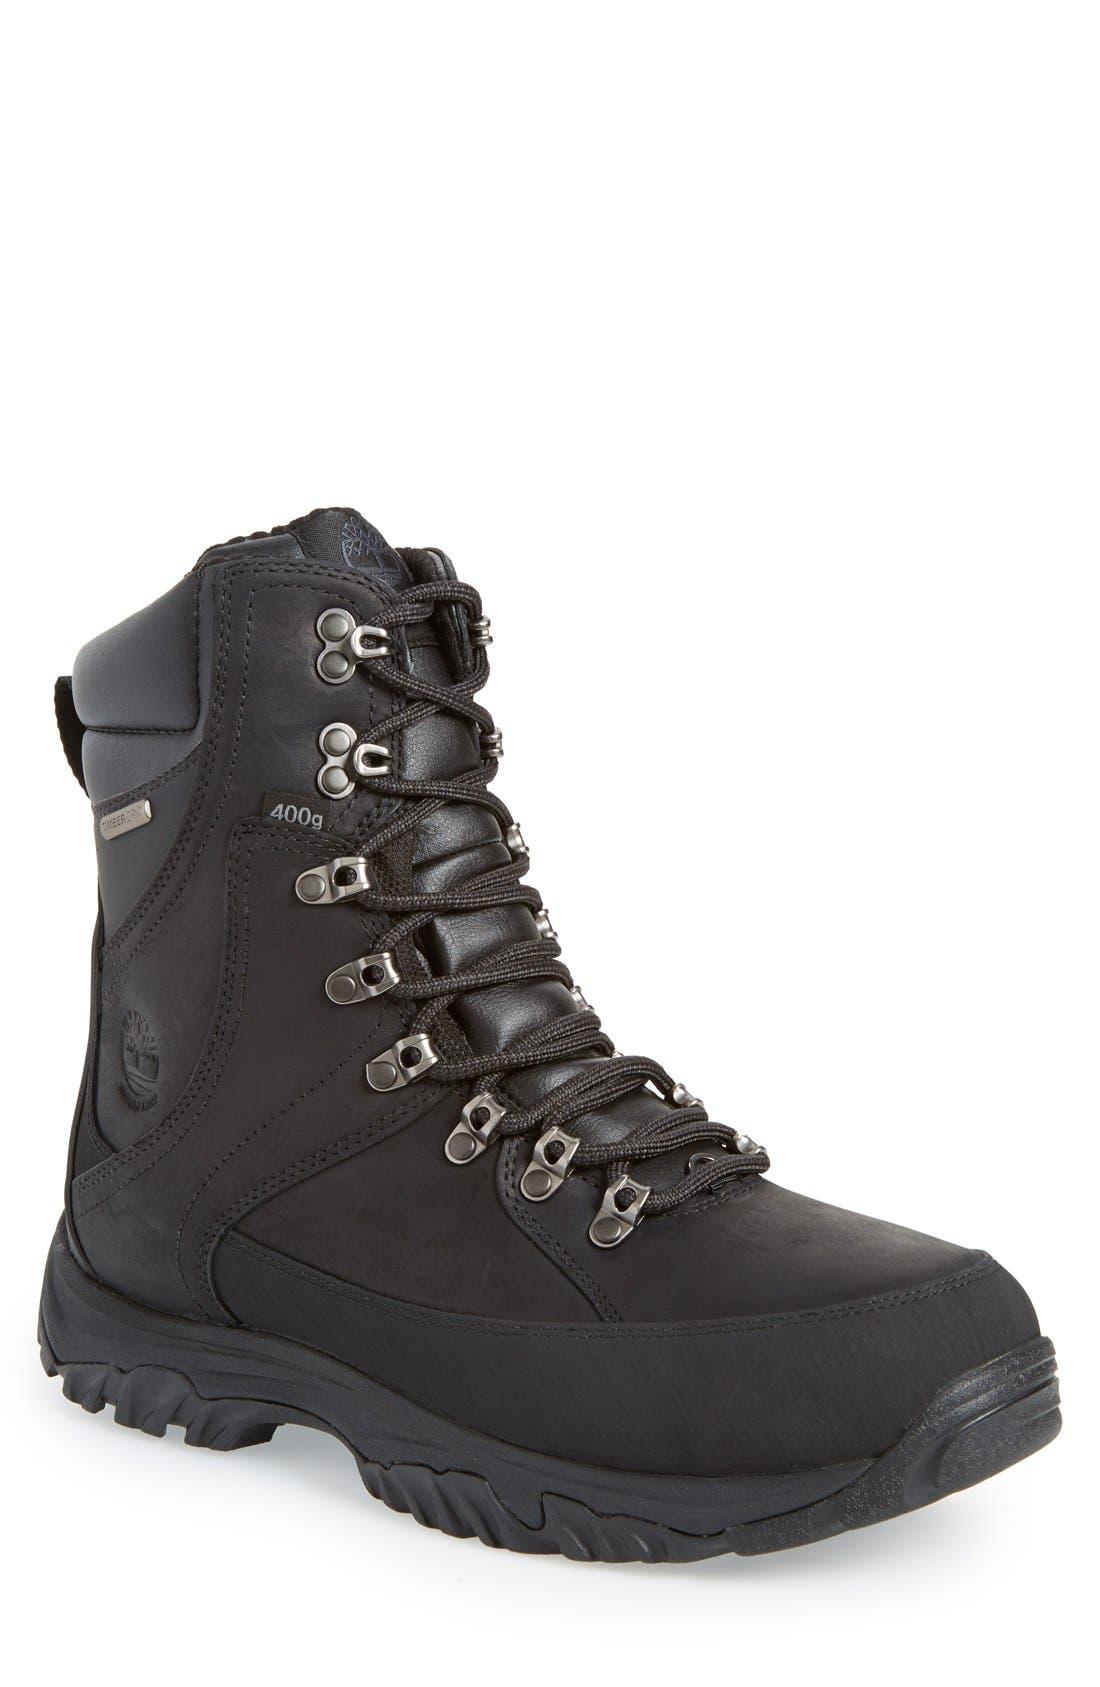 Alternate Image 1 Selected - Timberland 'Thorton' Waterproof Hiking Boot (Men)